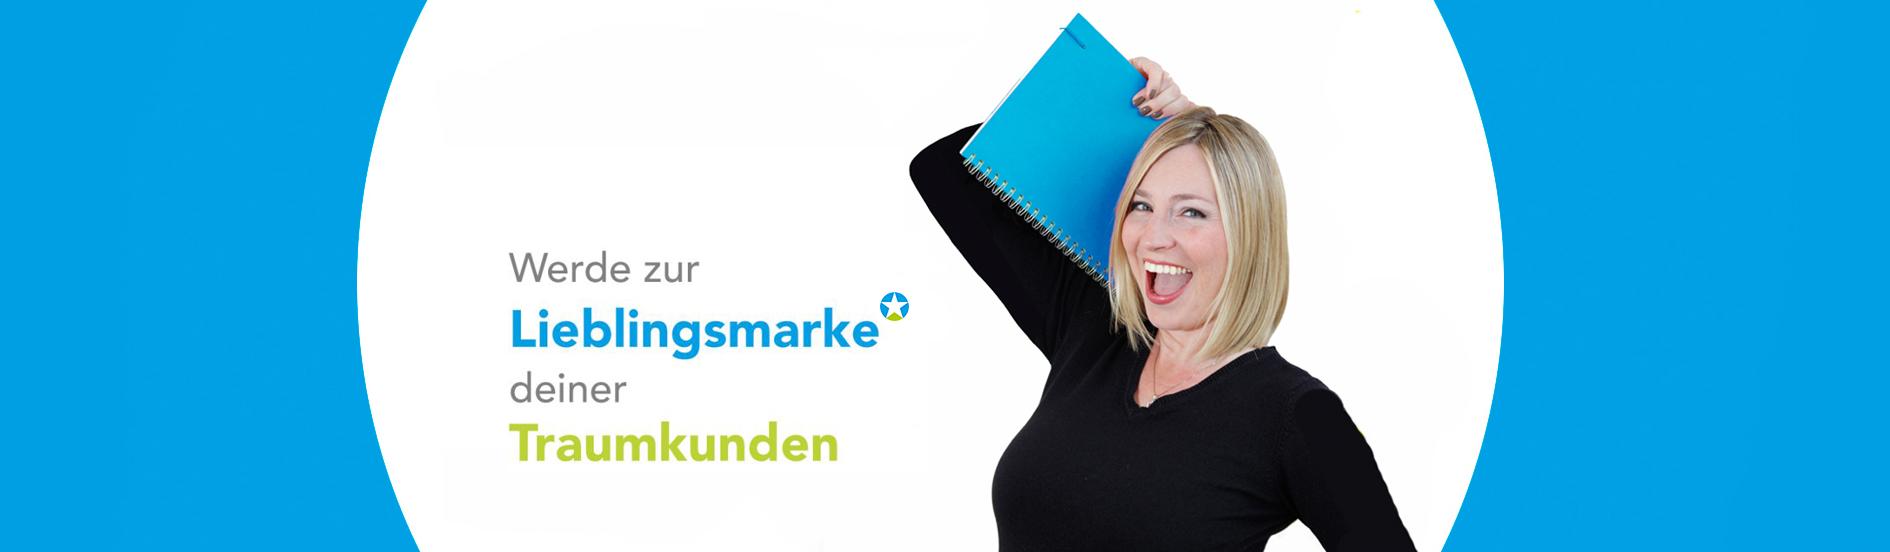 Andrea Yildiz Rebranding Expertin